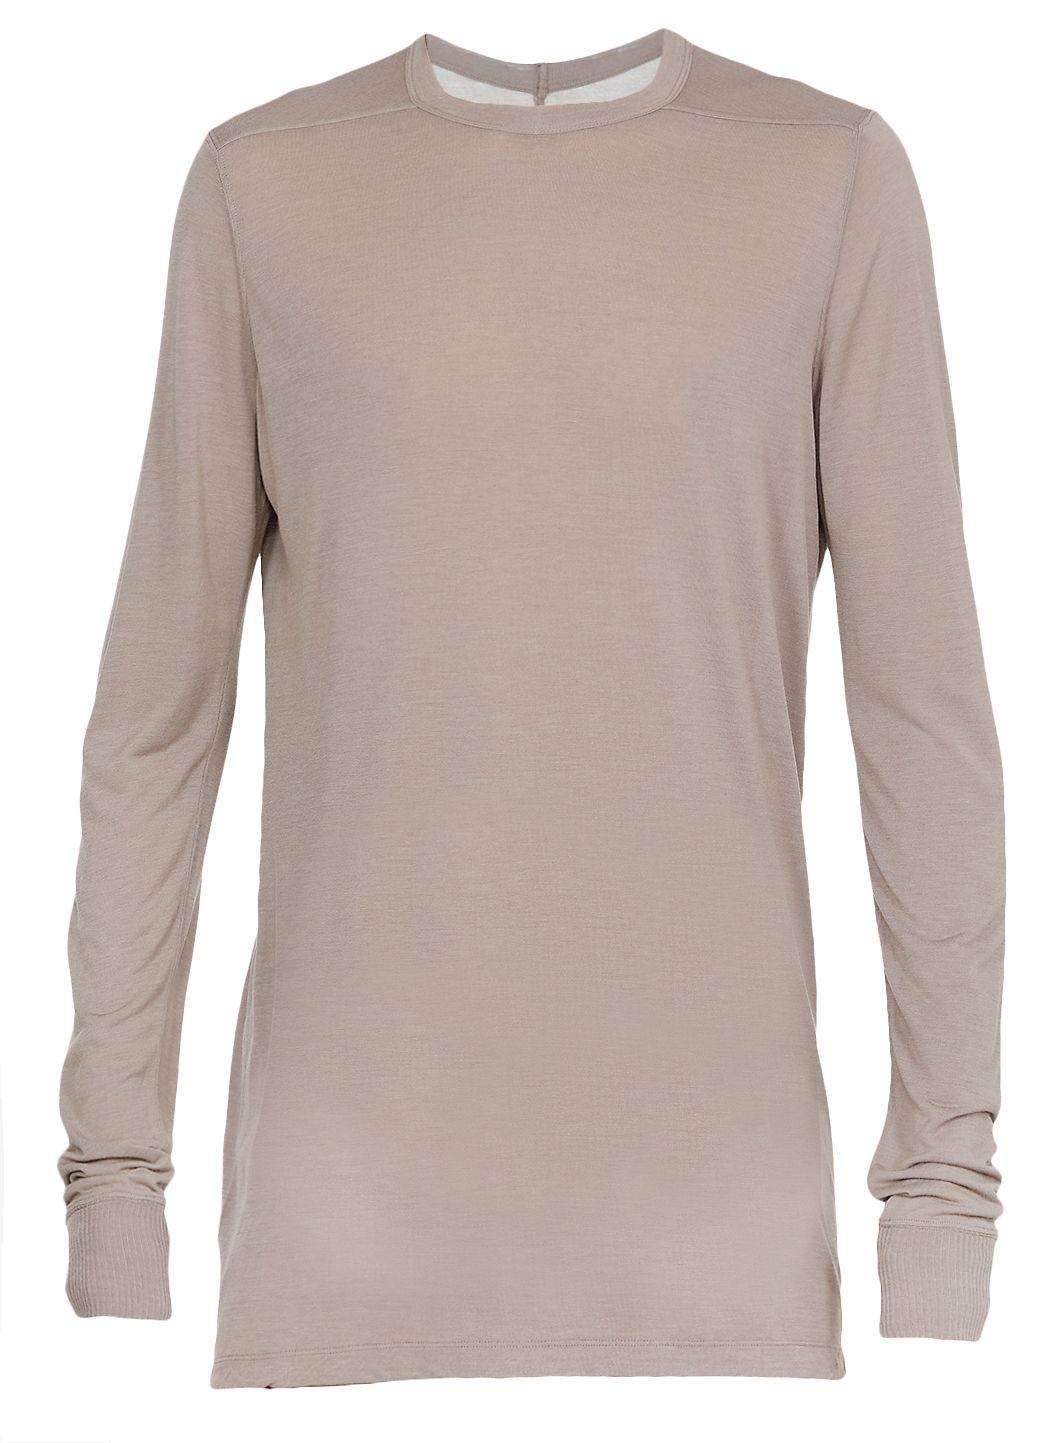 Ls level tee T-shirt